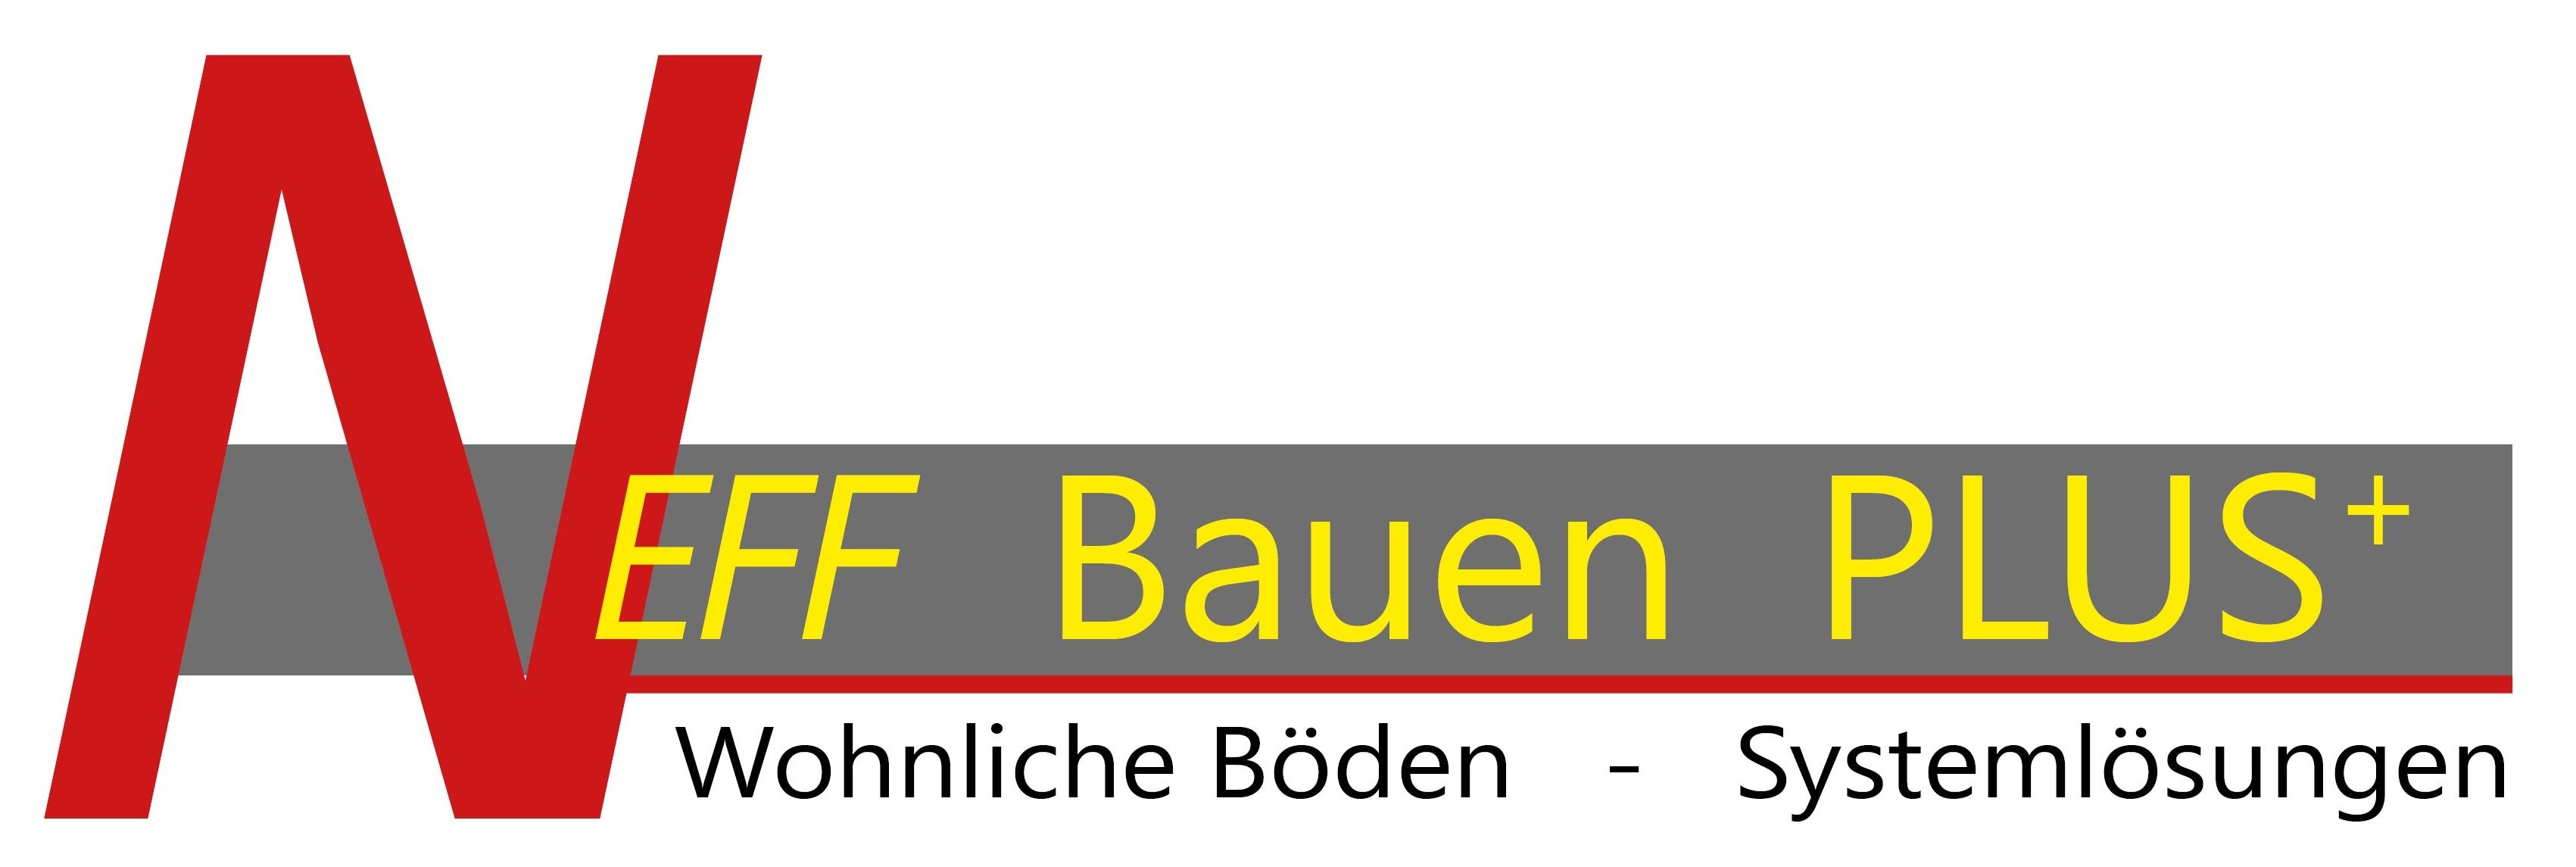 Bild Neff Bauen PLUS GmbH